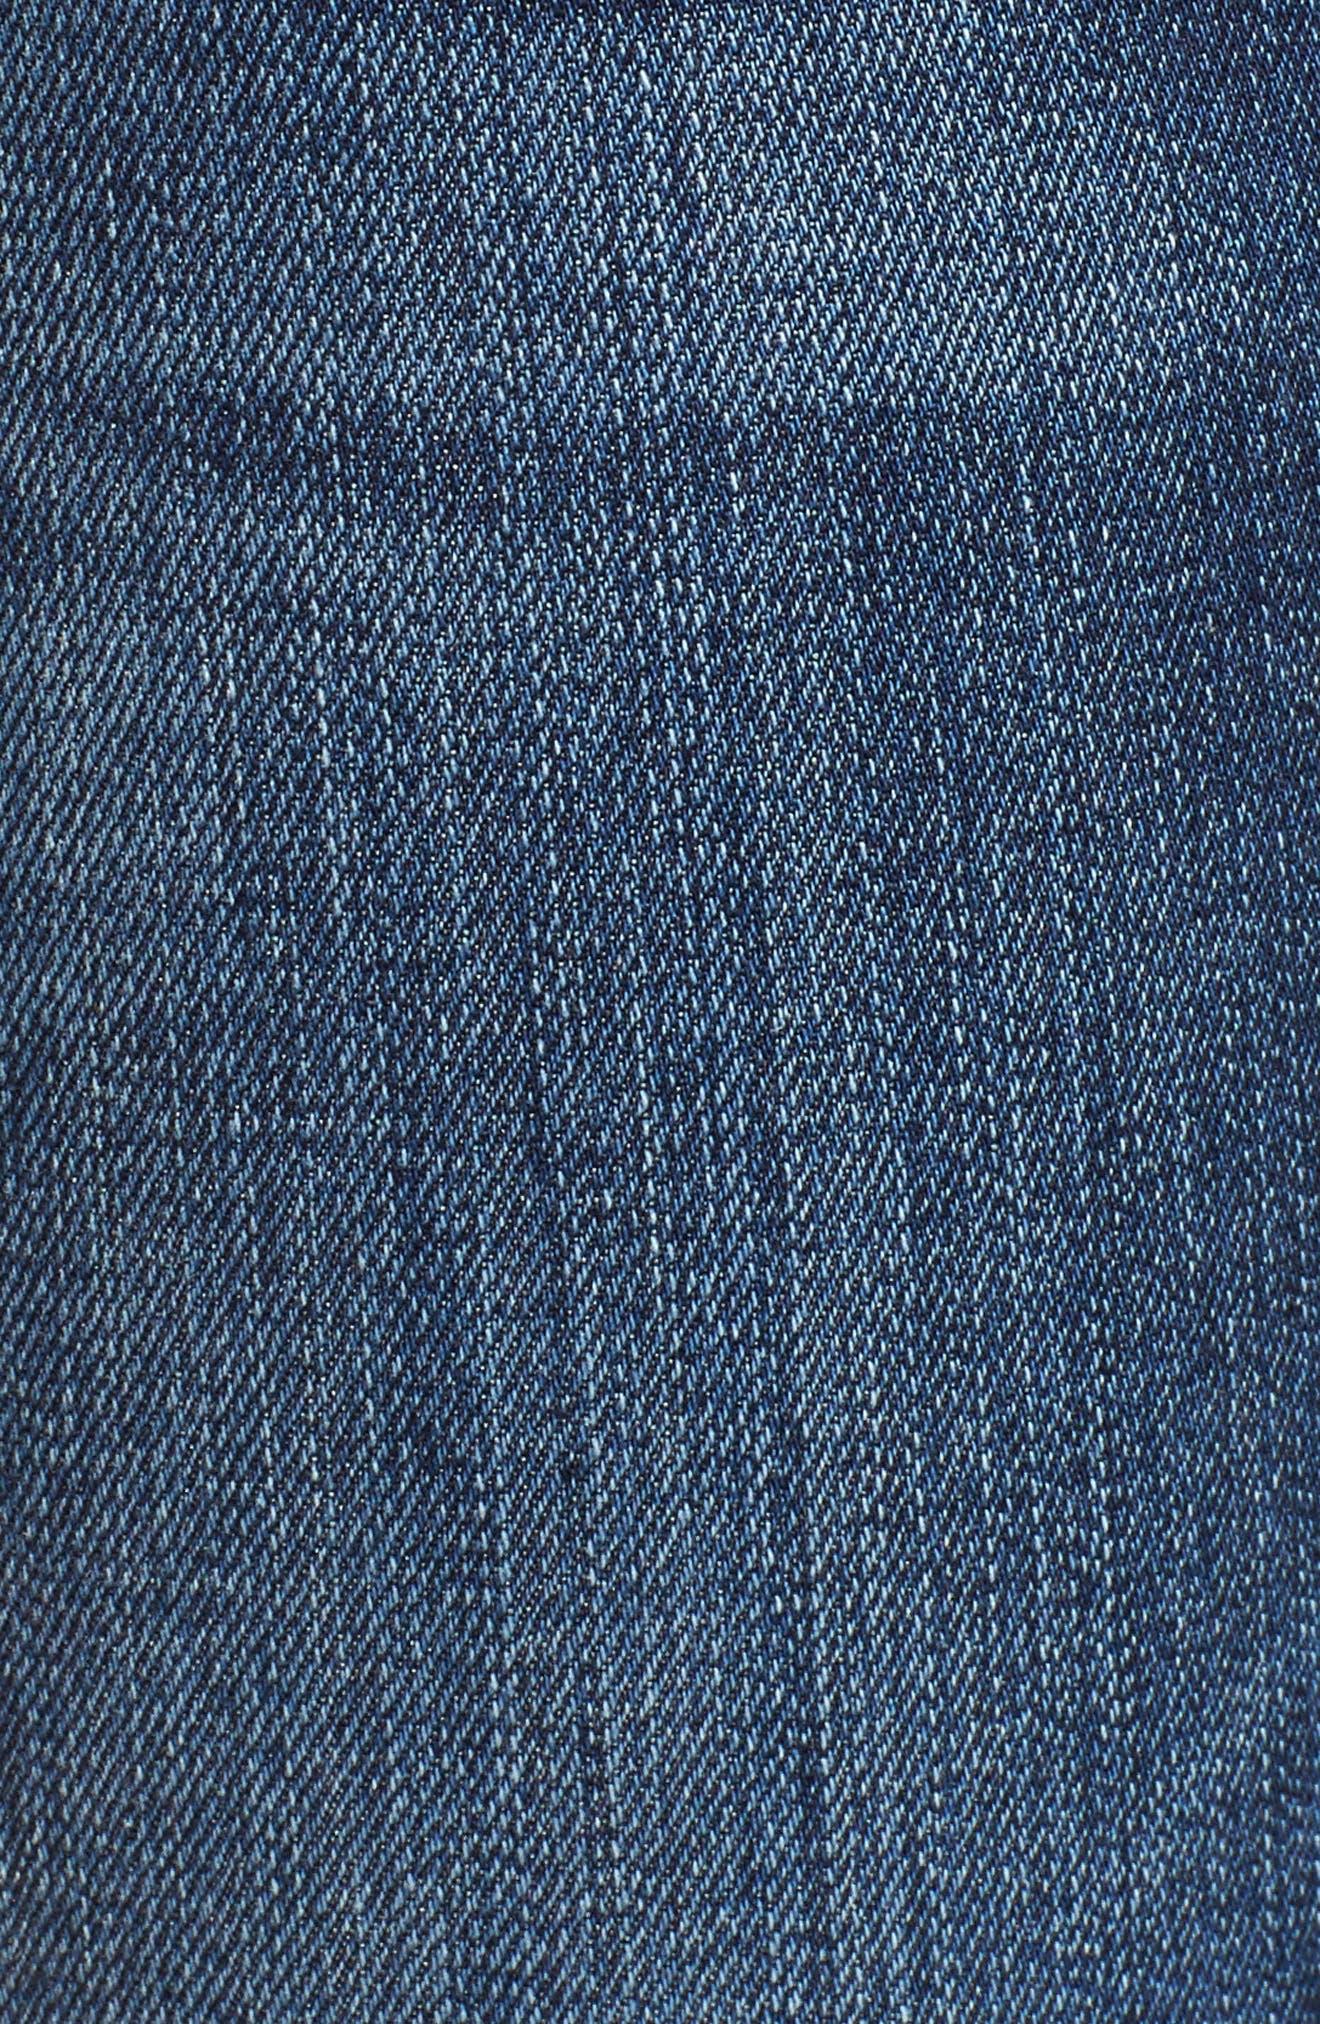 Barbara High Waist Ankle Skinny Jeans,                             Alternate thumbnail 3, color,                             Dare